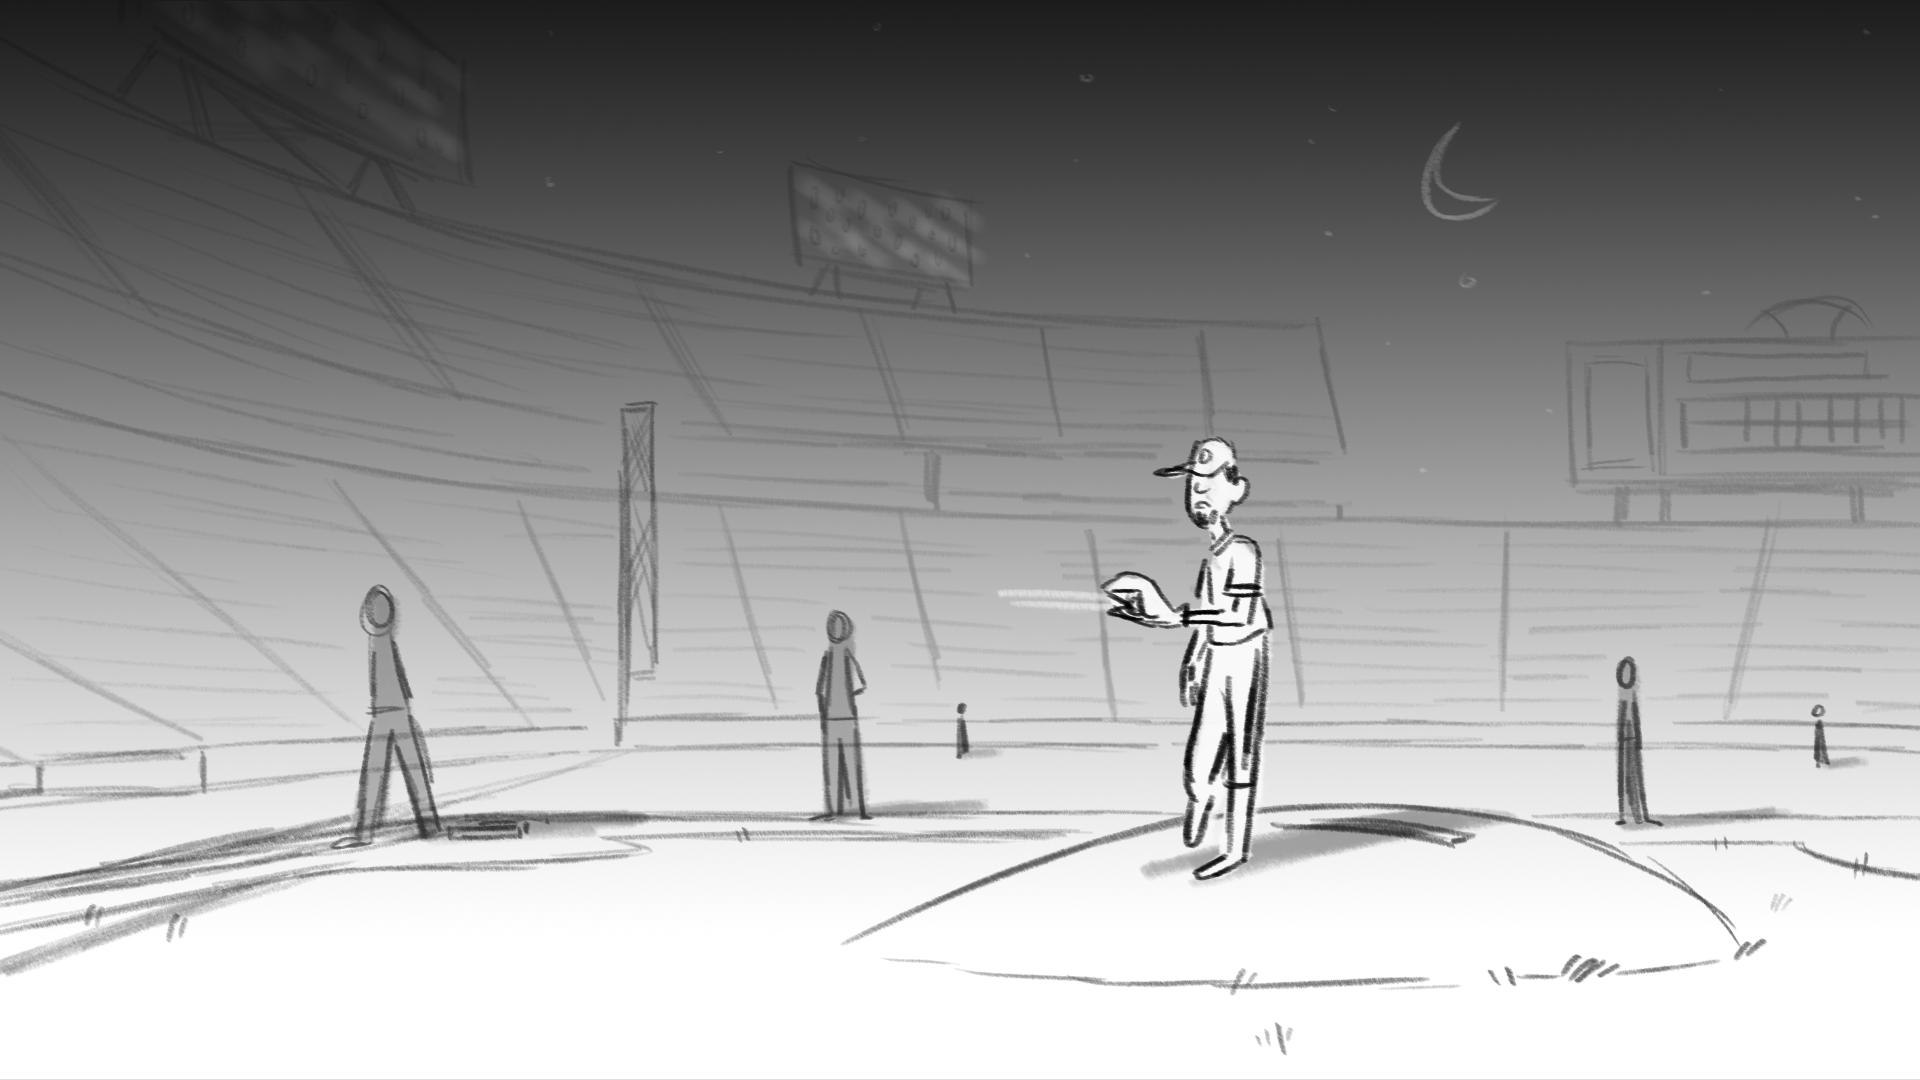 baseballBoards_A__0010_Layer-Comp-11.png